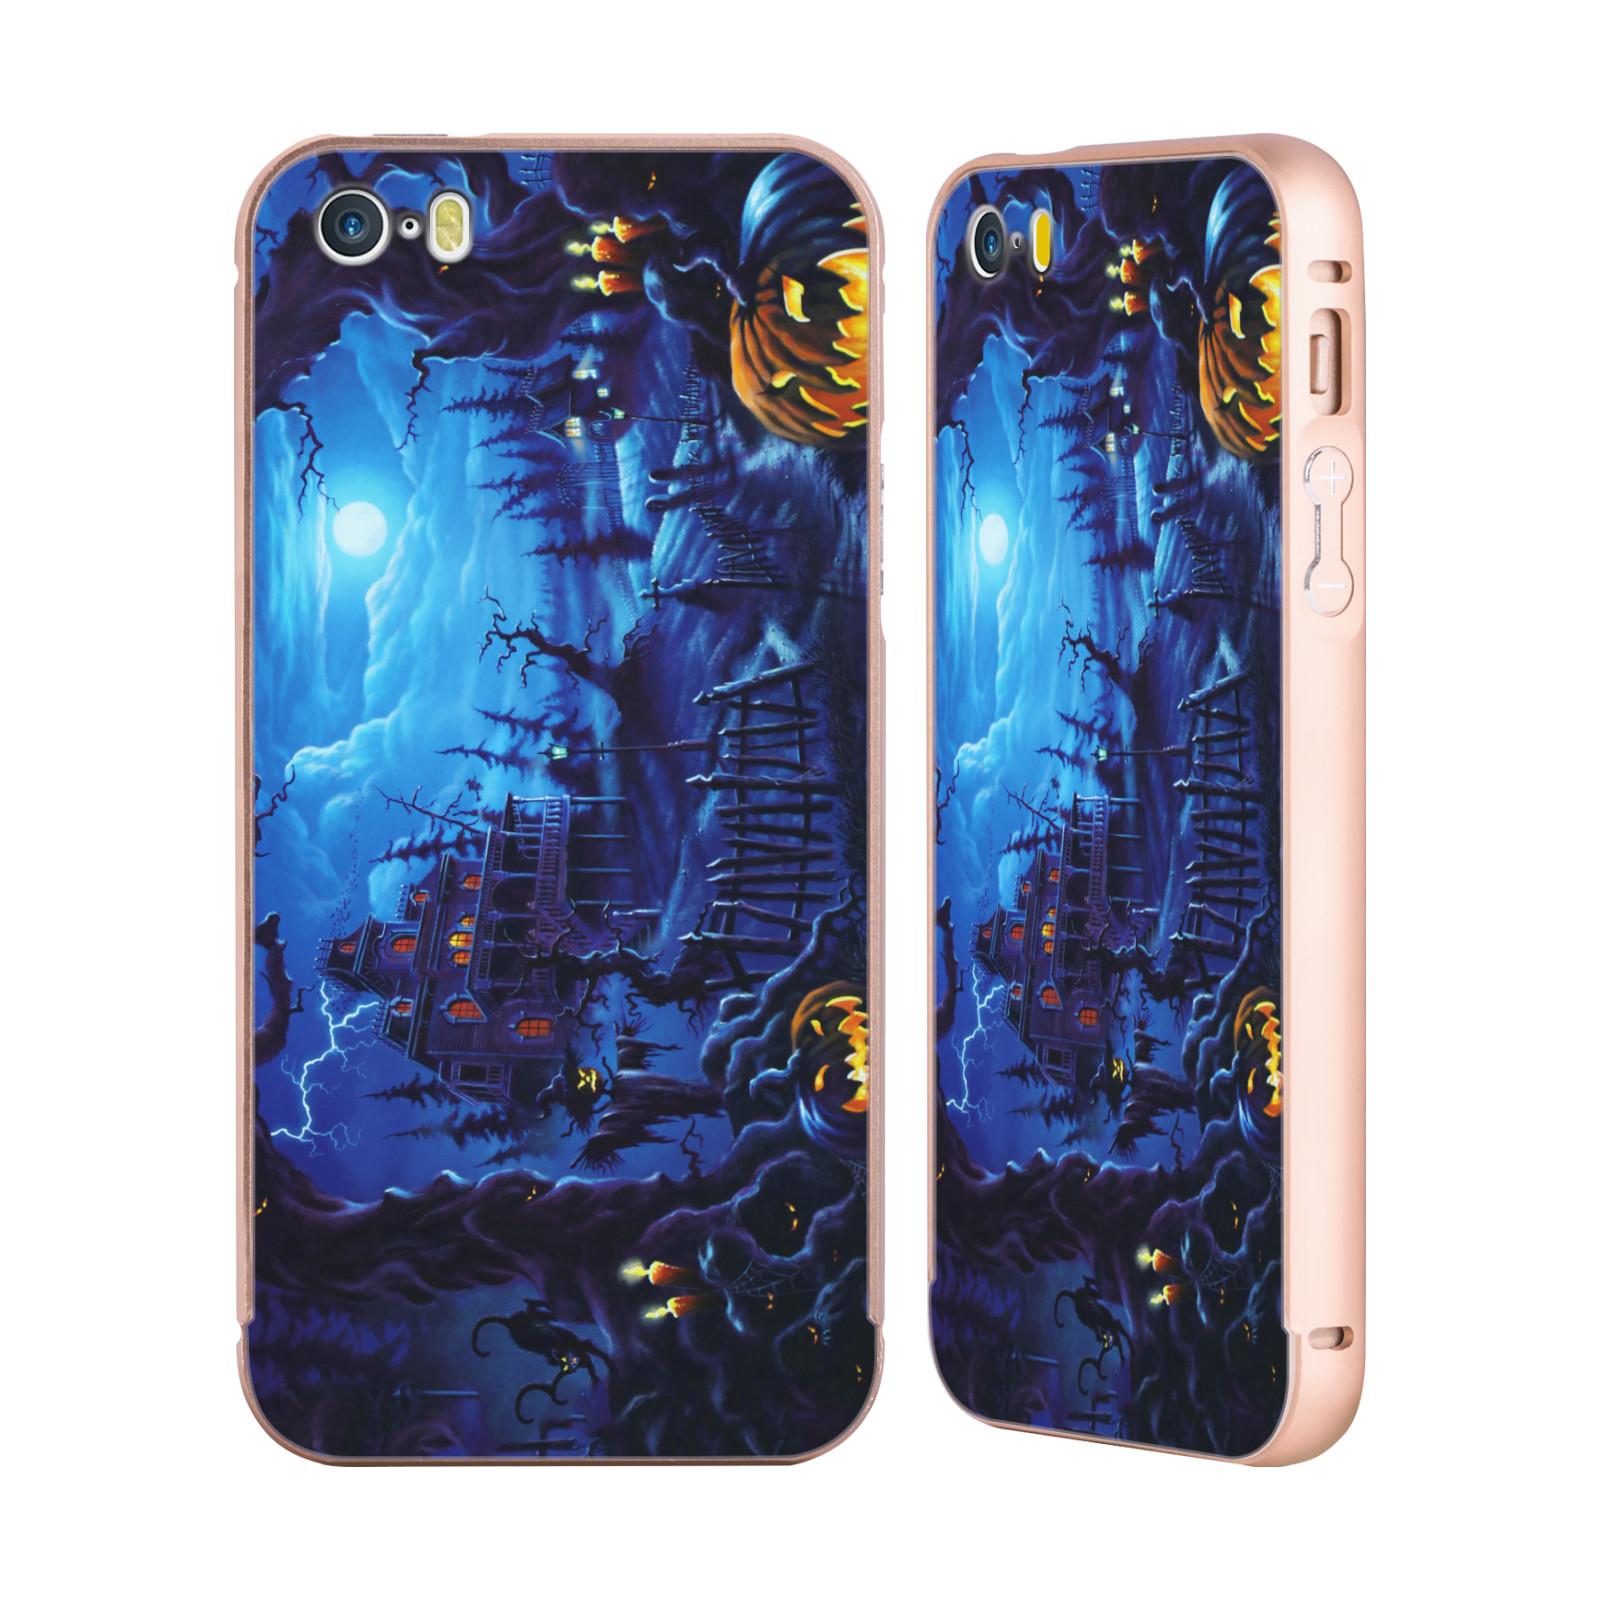 OFFICIAL-GENO-PEOPLES-ART-HALLOWEEN-GOLD-SLIDER-CASE-FOR-APPLE-iPHONE-PHONES